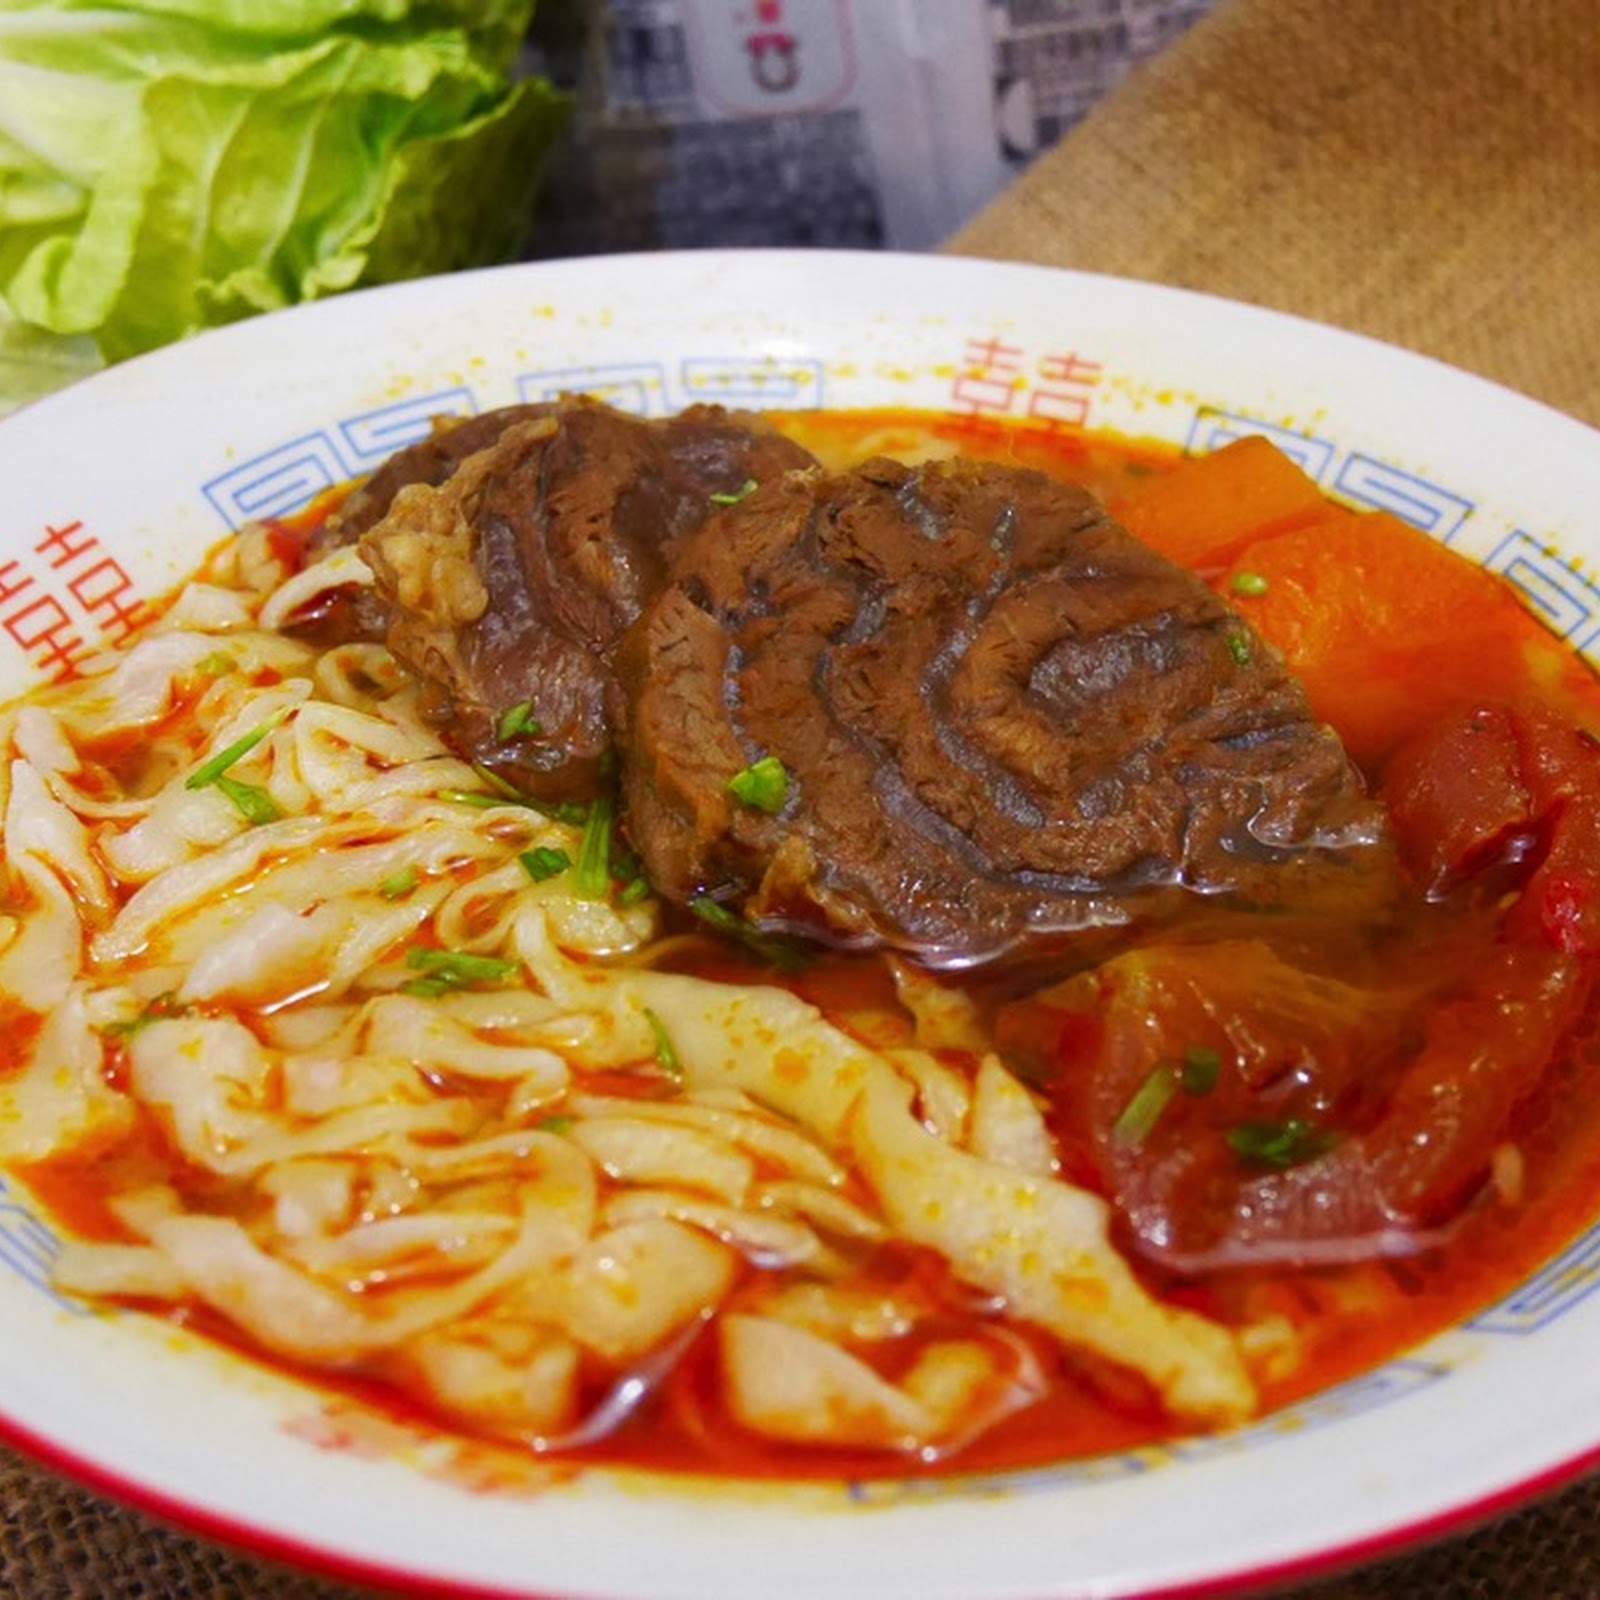 紅燒牛肉麵 Braised Beef Noodle Soup【老娘的草根飯堂OldLady's Kitchen】